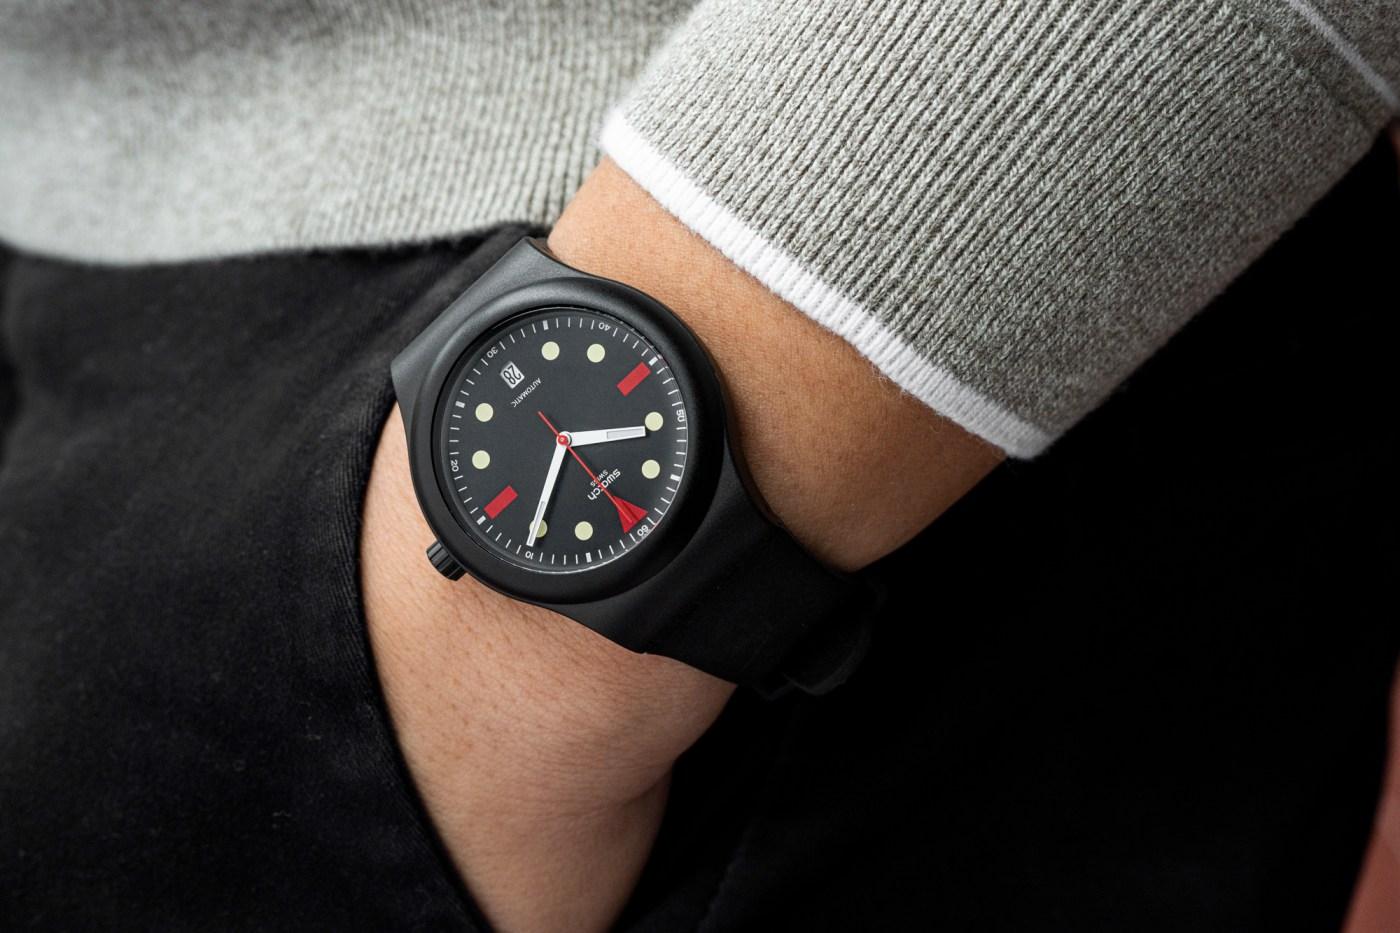 Swatch Sistem51 Hodinkee Generation 1986 wristshot